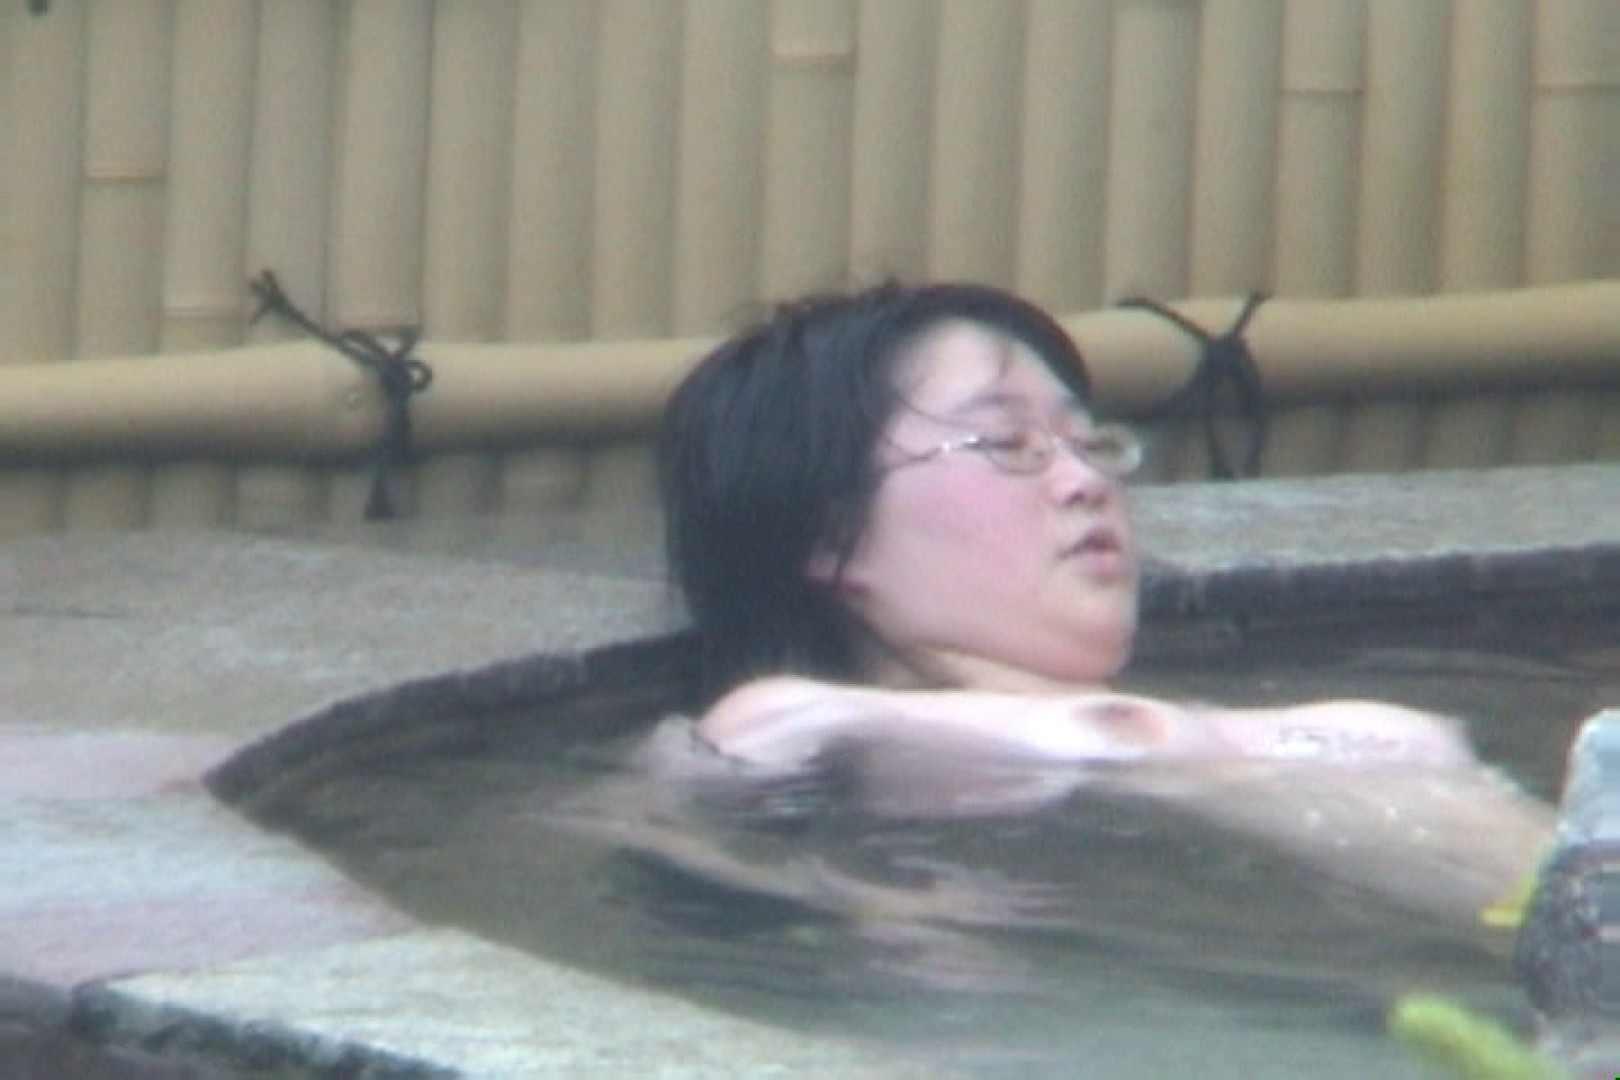 Aquaな露天風呂Vol.46【VIP限定】 女体盗撮 | 露天  98連発 13